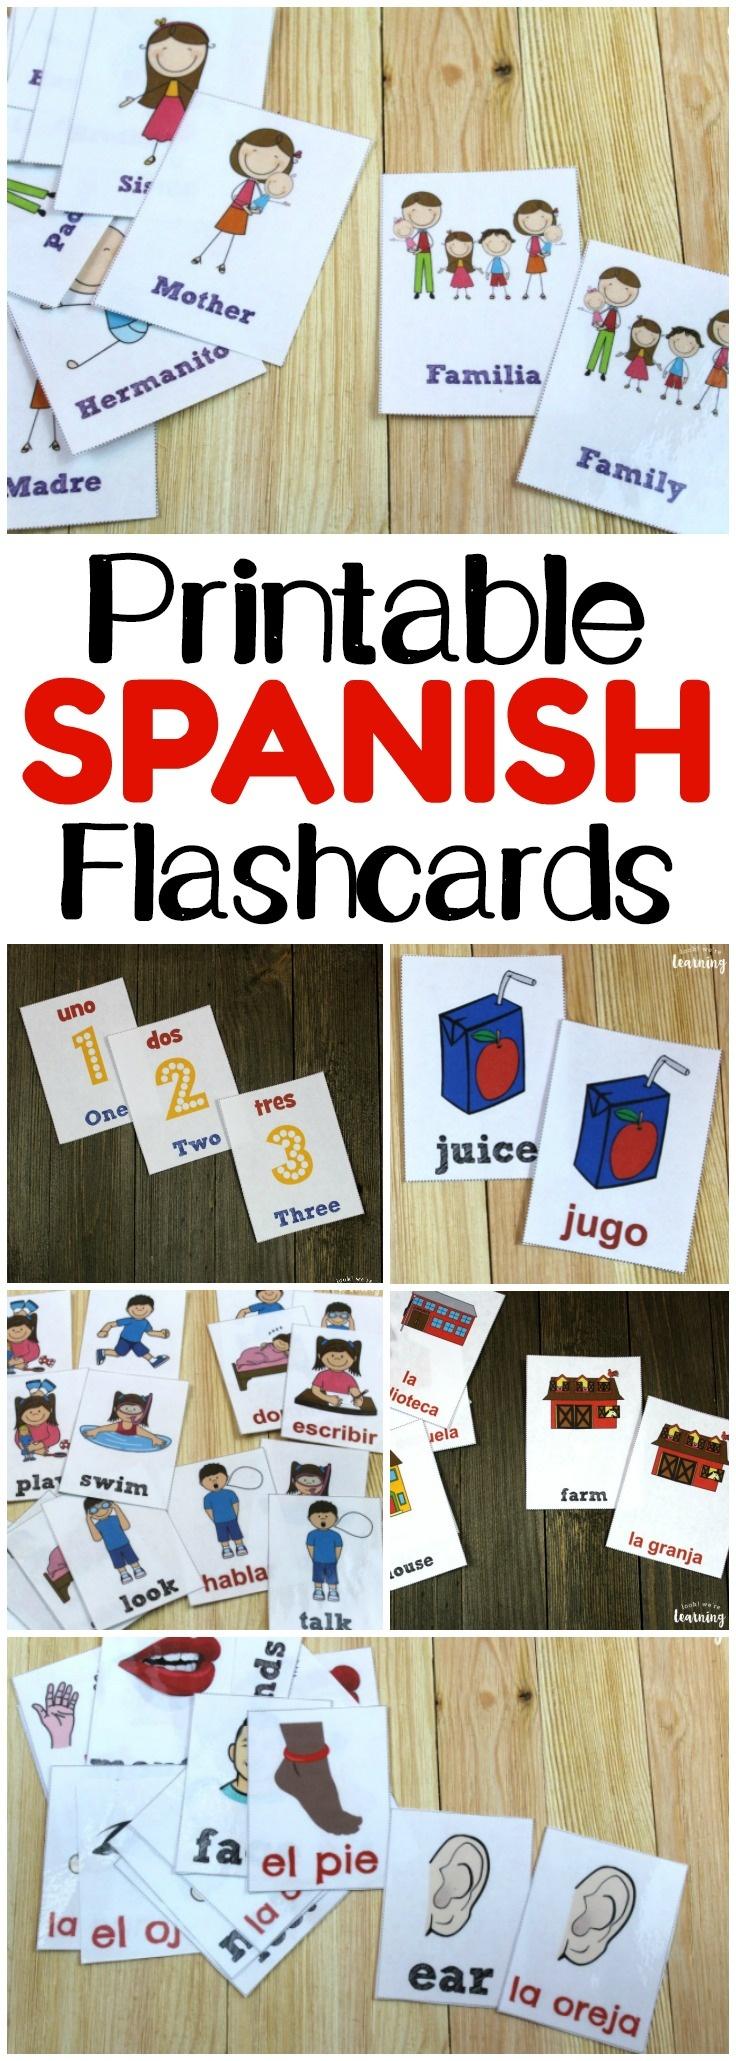 Printable Spanish Flashcards - Look! We're Learning! - Free Printable Spanish Verb Flashcards